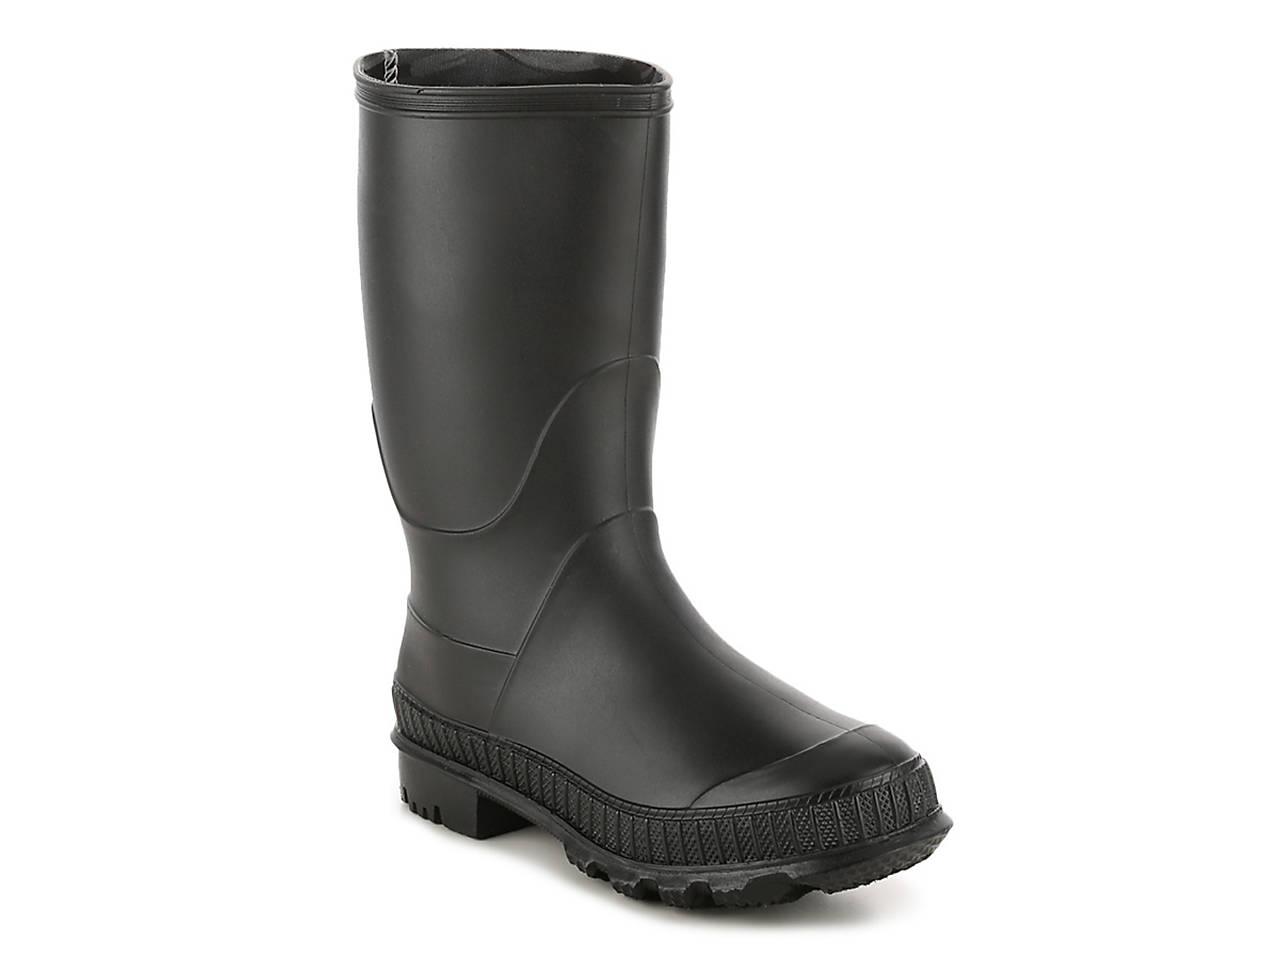 Carter's Kids' Rain Boot (black) $9 + Free Shipping